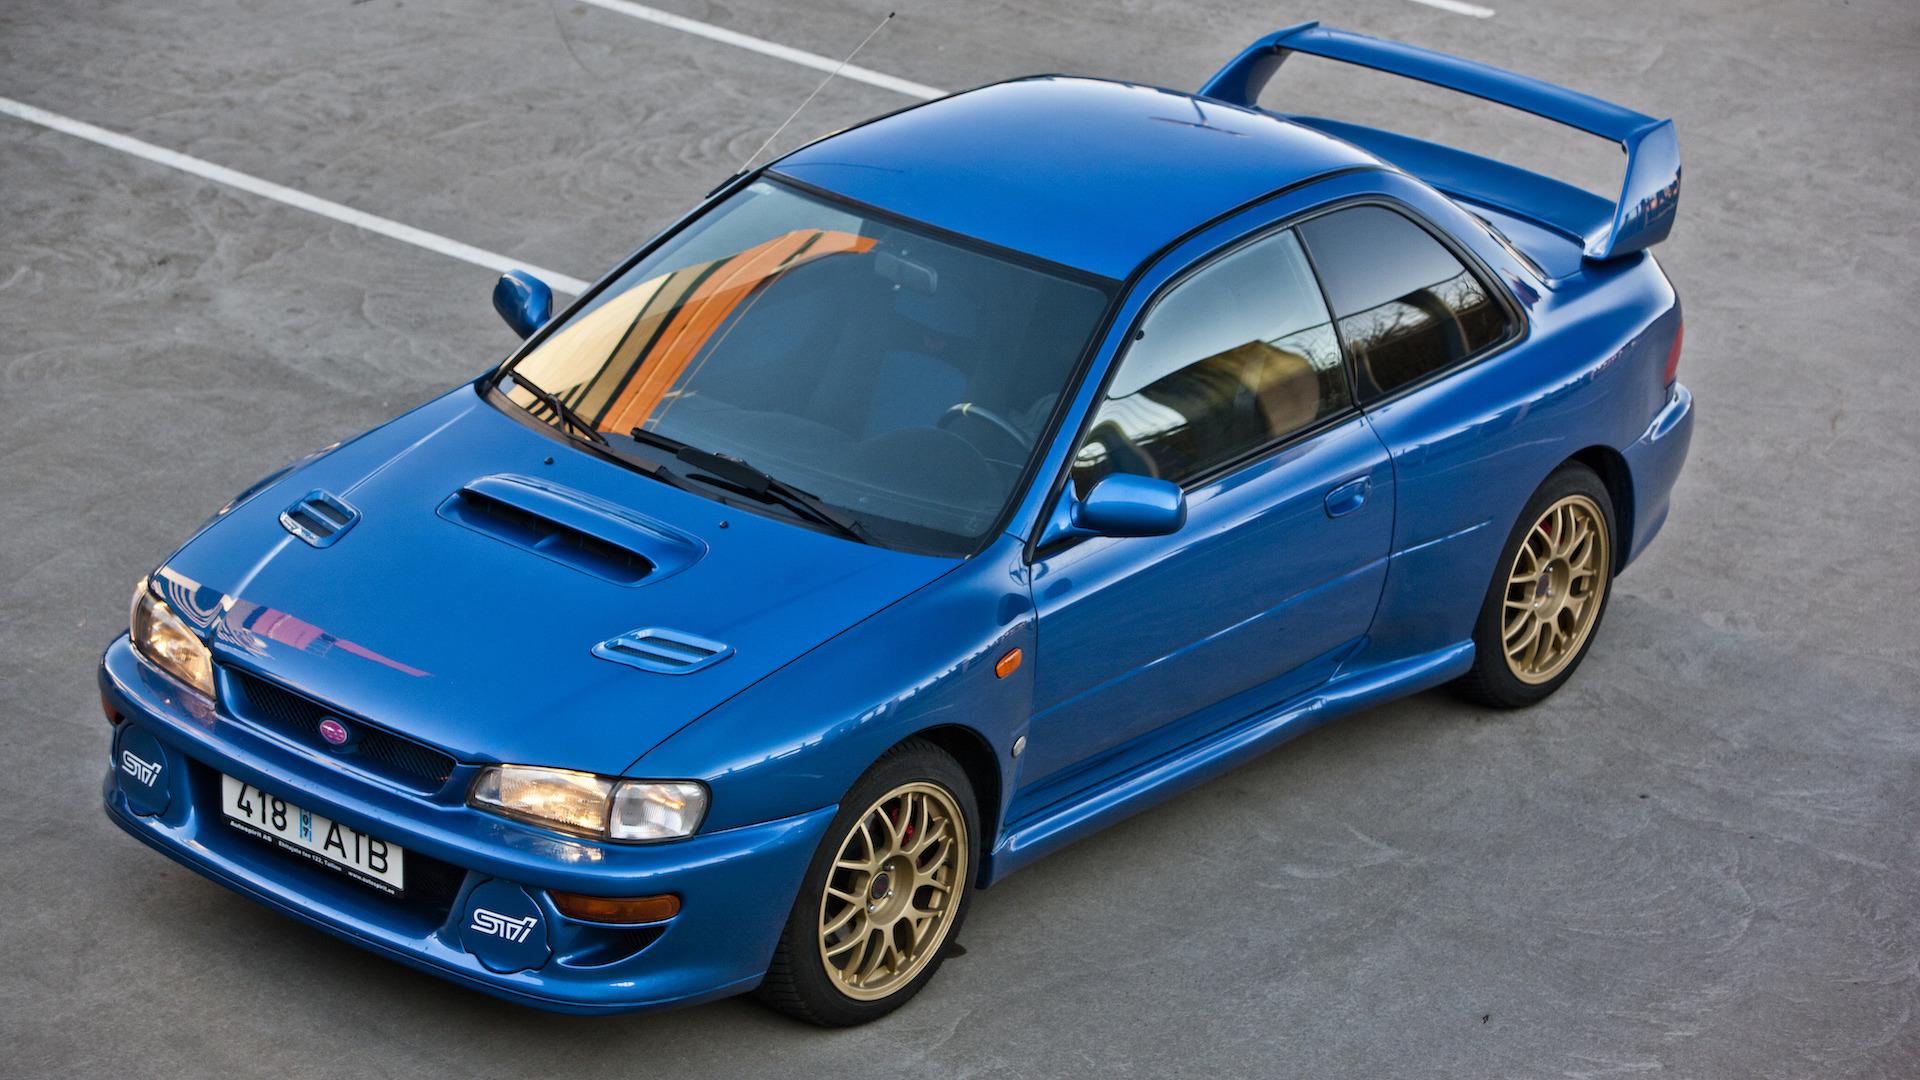 A Holy Grail Subaru Impreza 22B STi is up for sale